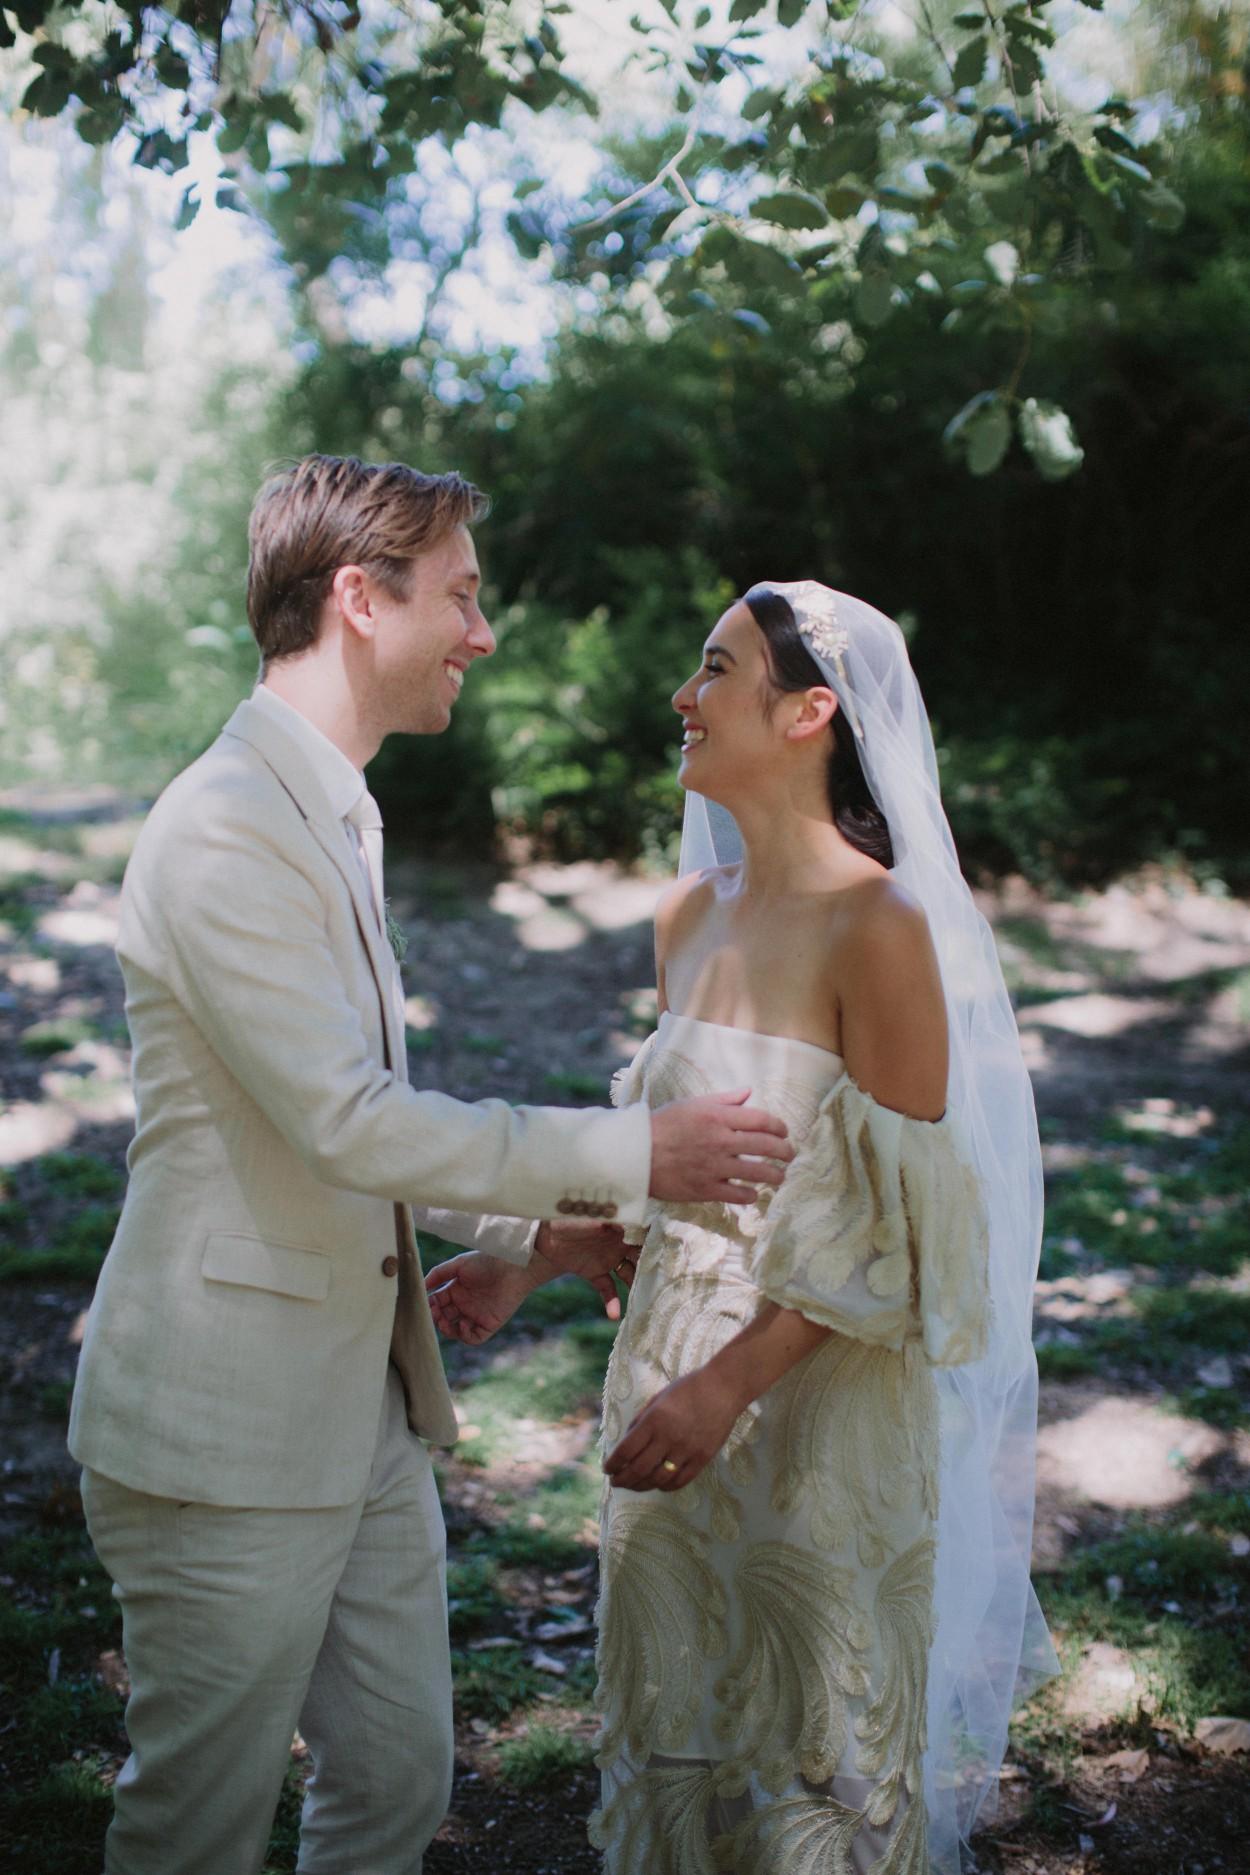 I-Got-You-Babe-Weddings-Heide-Museum-of-Modern-Art-Elopement-Susie-Nathan024.jpg